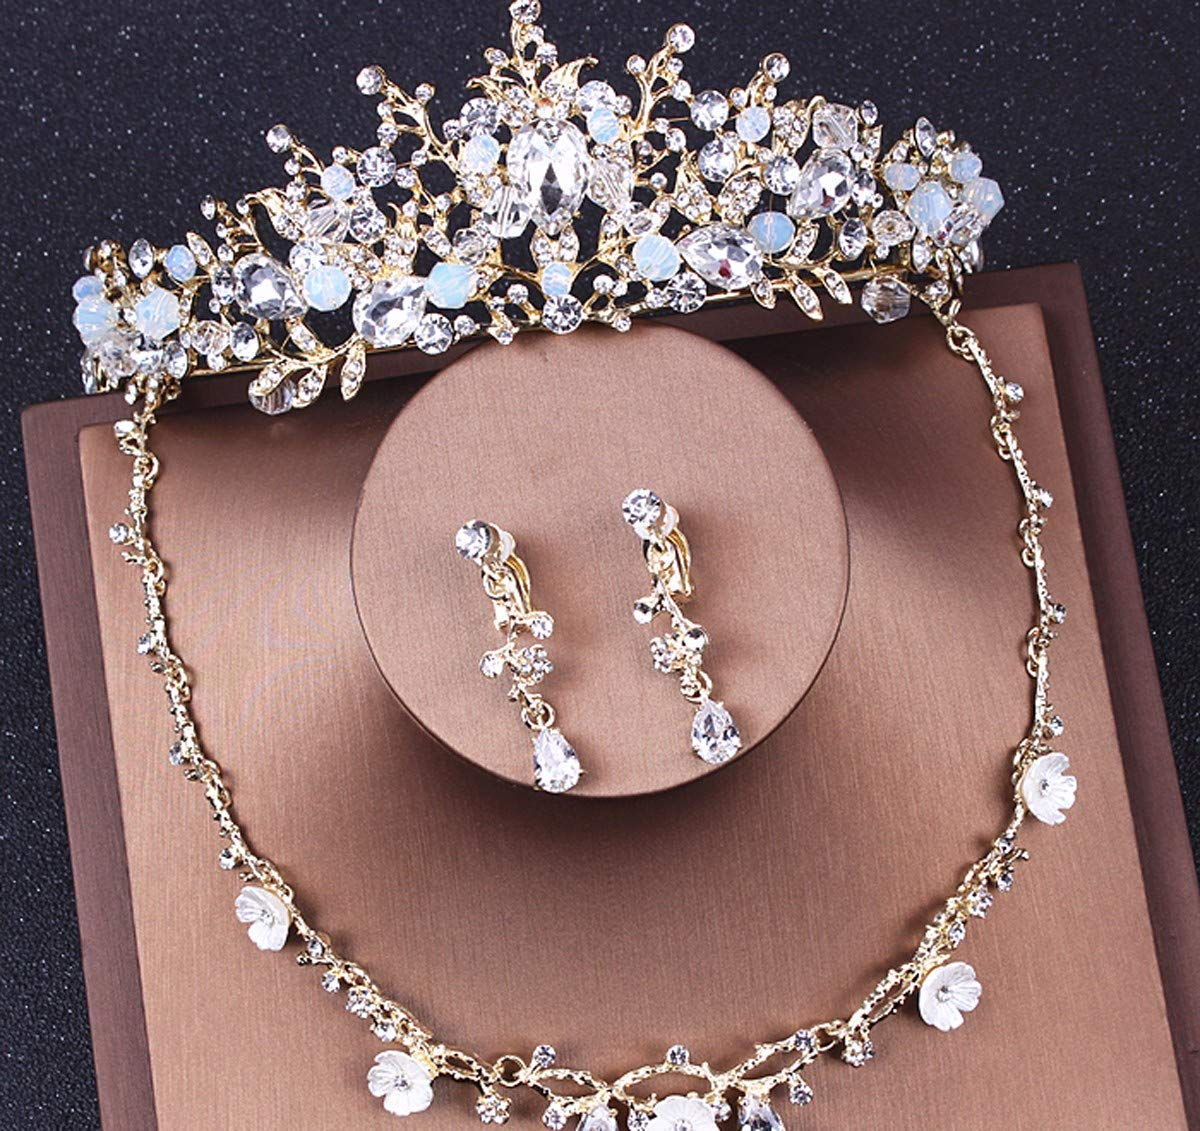 Girls Crown, Beautiful headdress/Crown Dress Bridal Wedding Accessories Necklace Baroque Crown Wedding Accessories by Zehaer (Image #2)